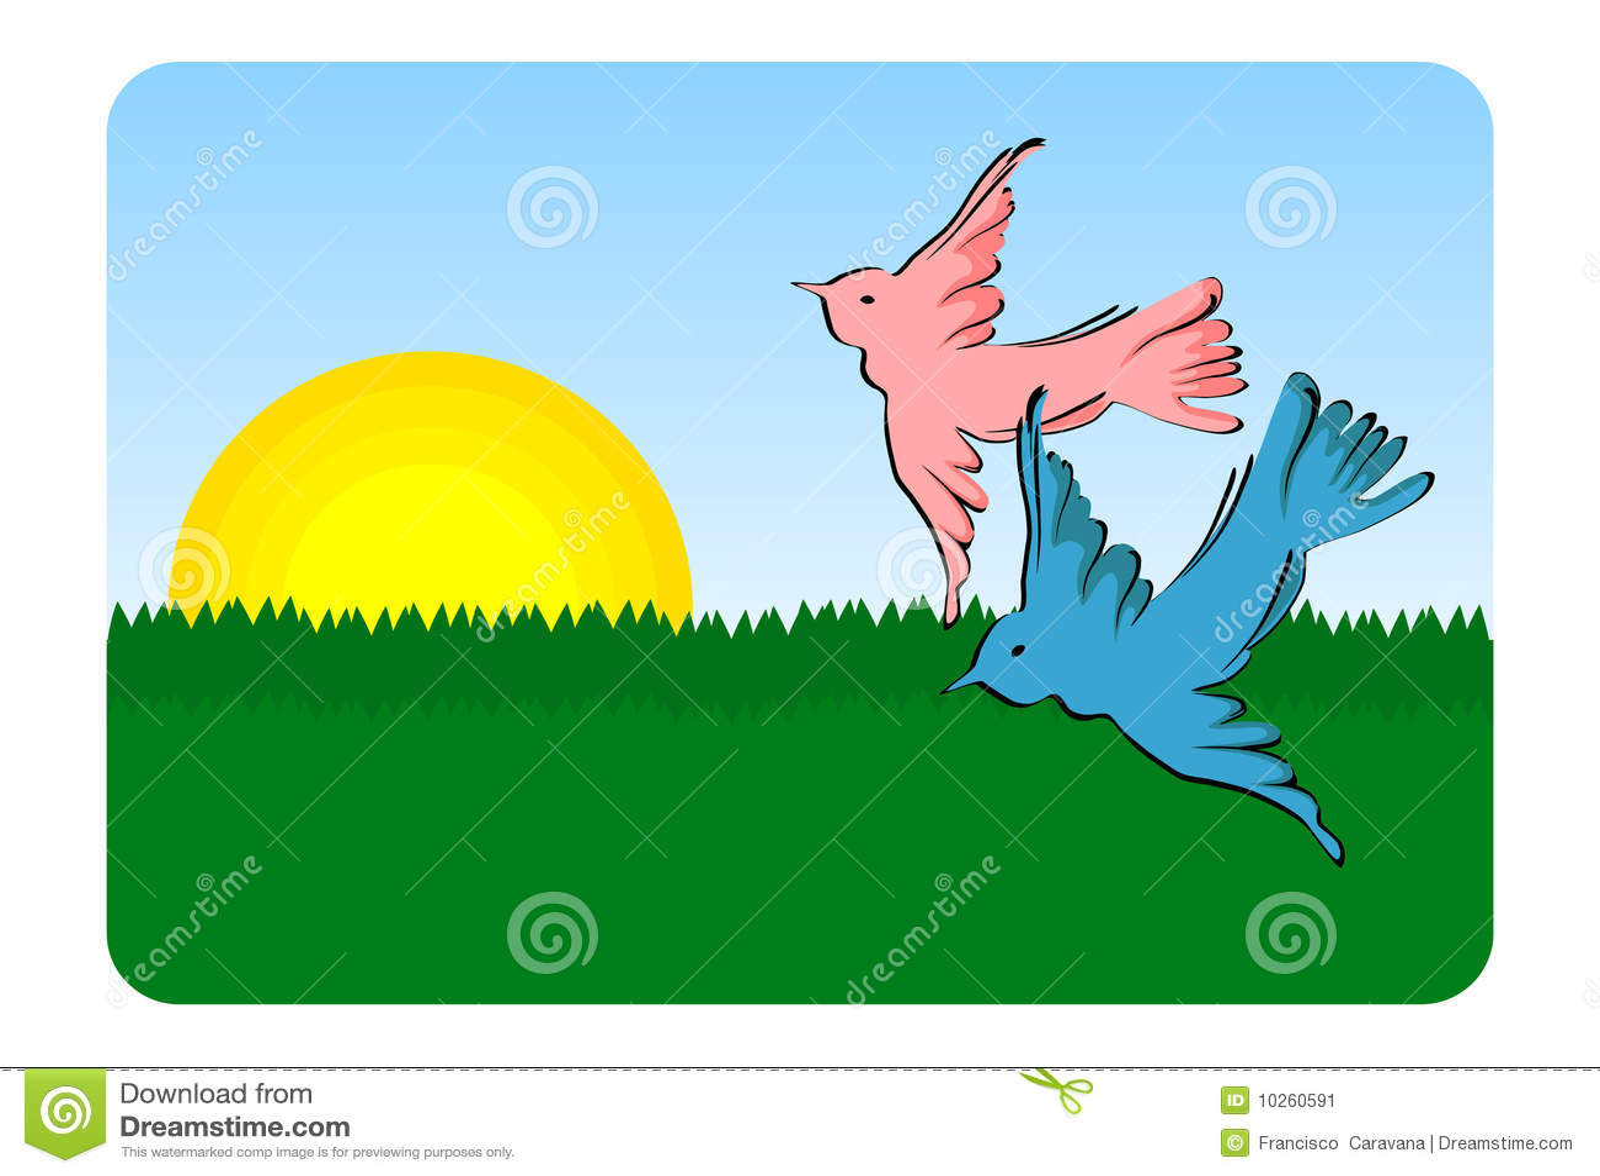 Birds flying - vector